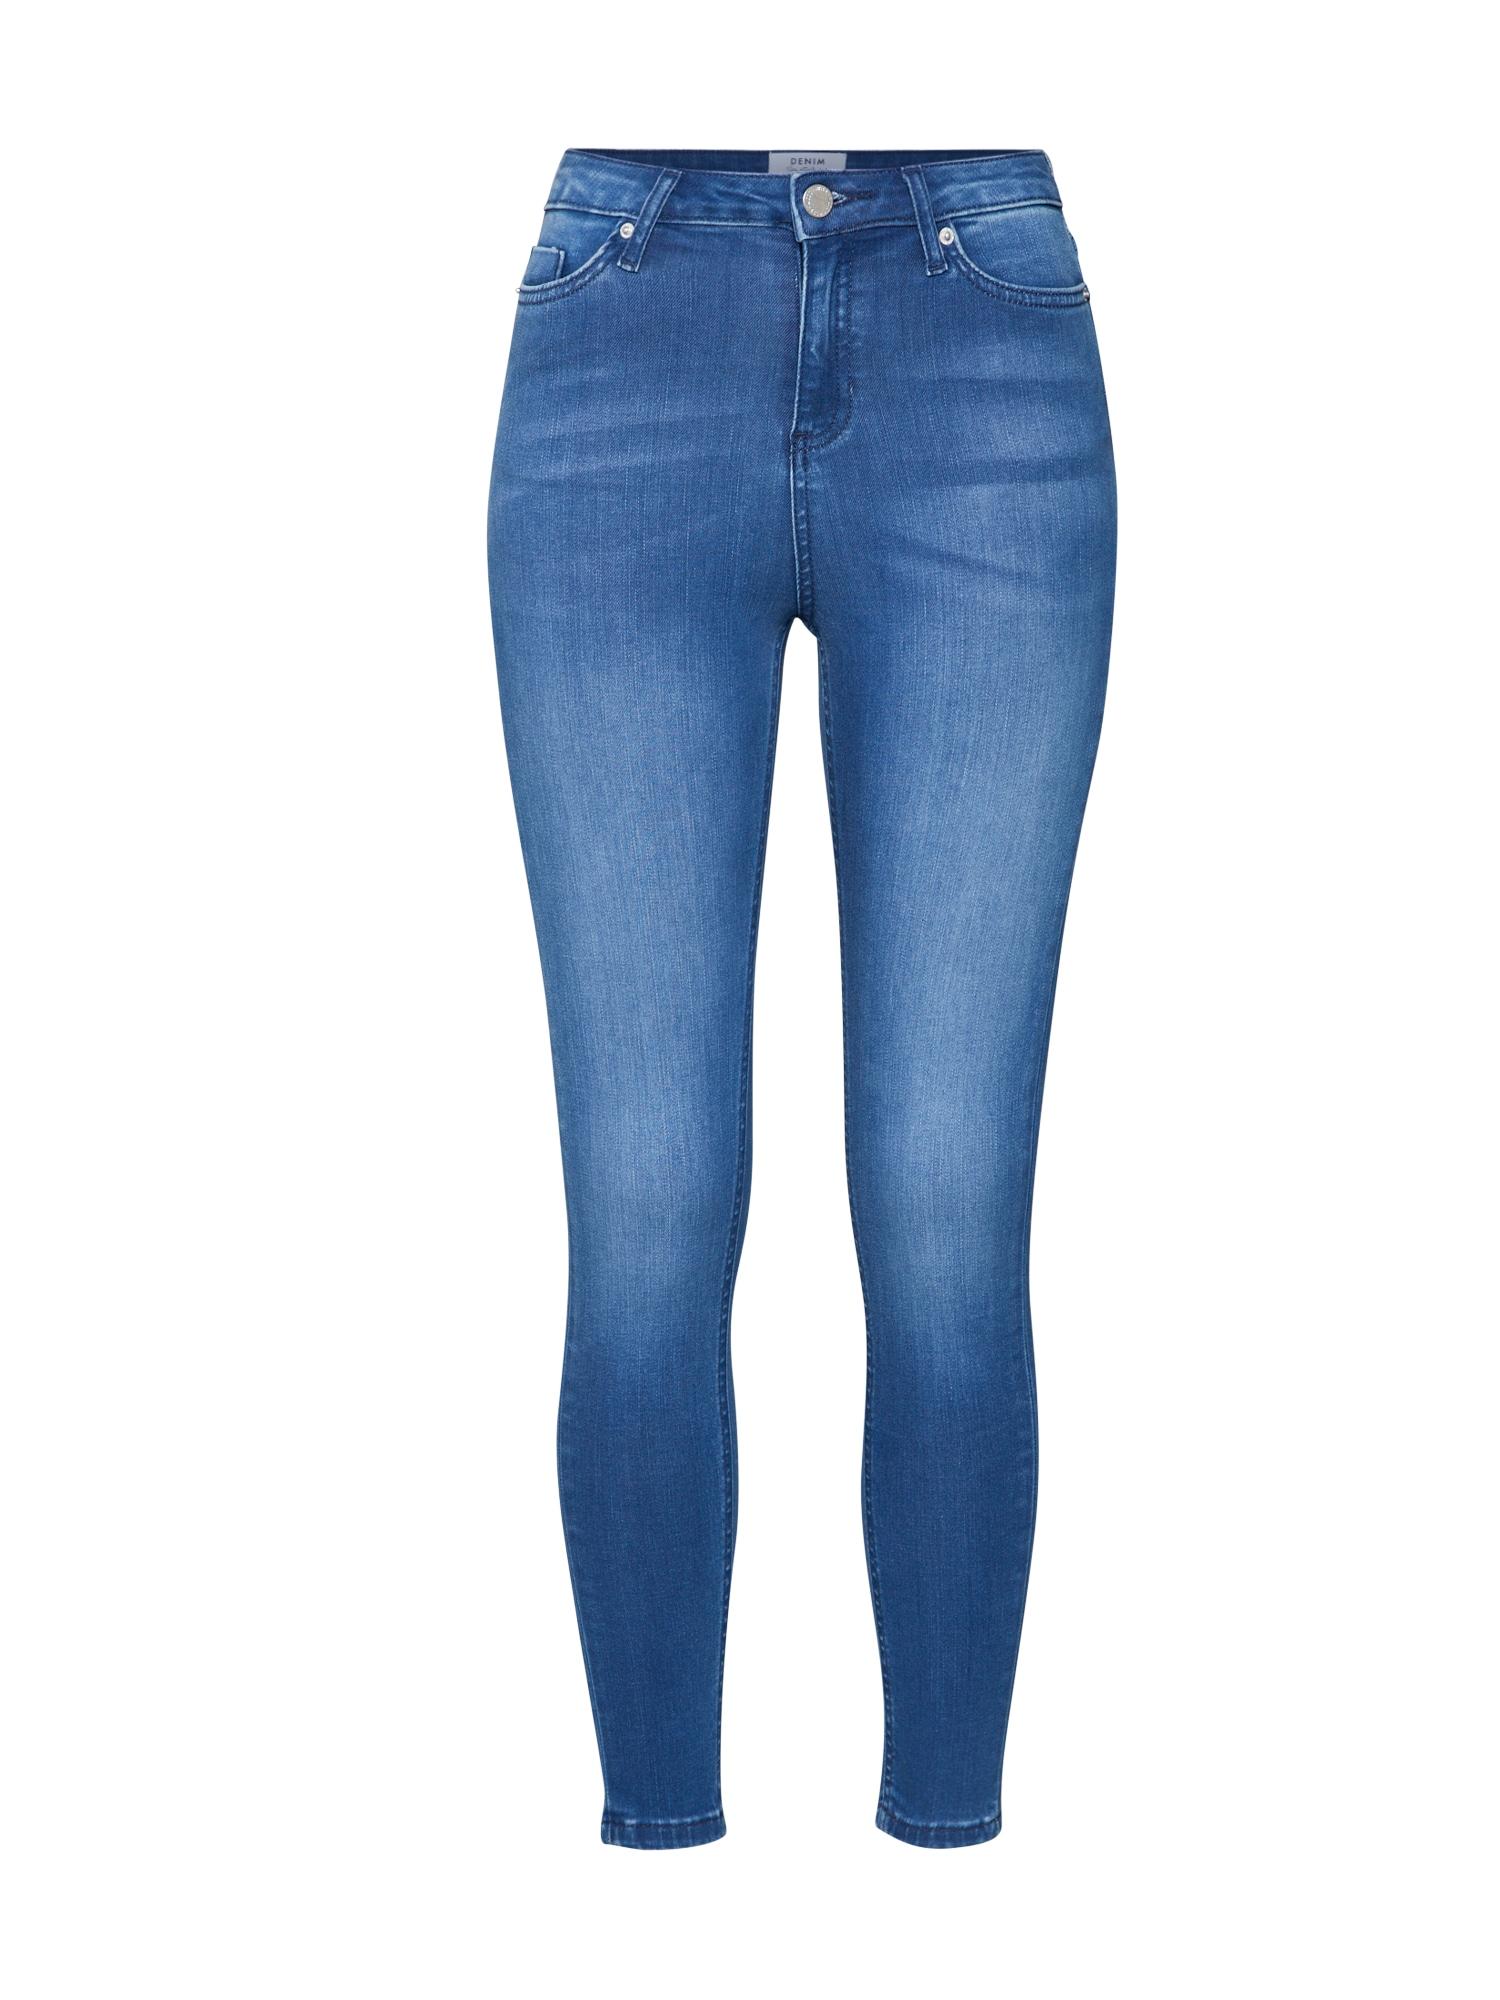 jeans 'i17l16wmdt'